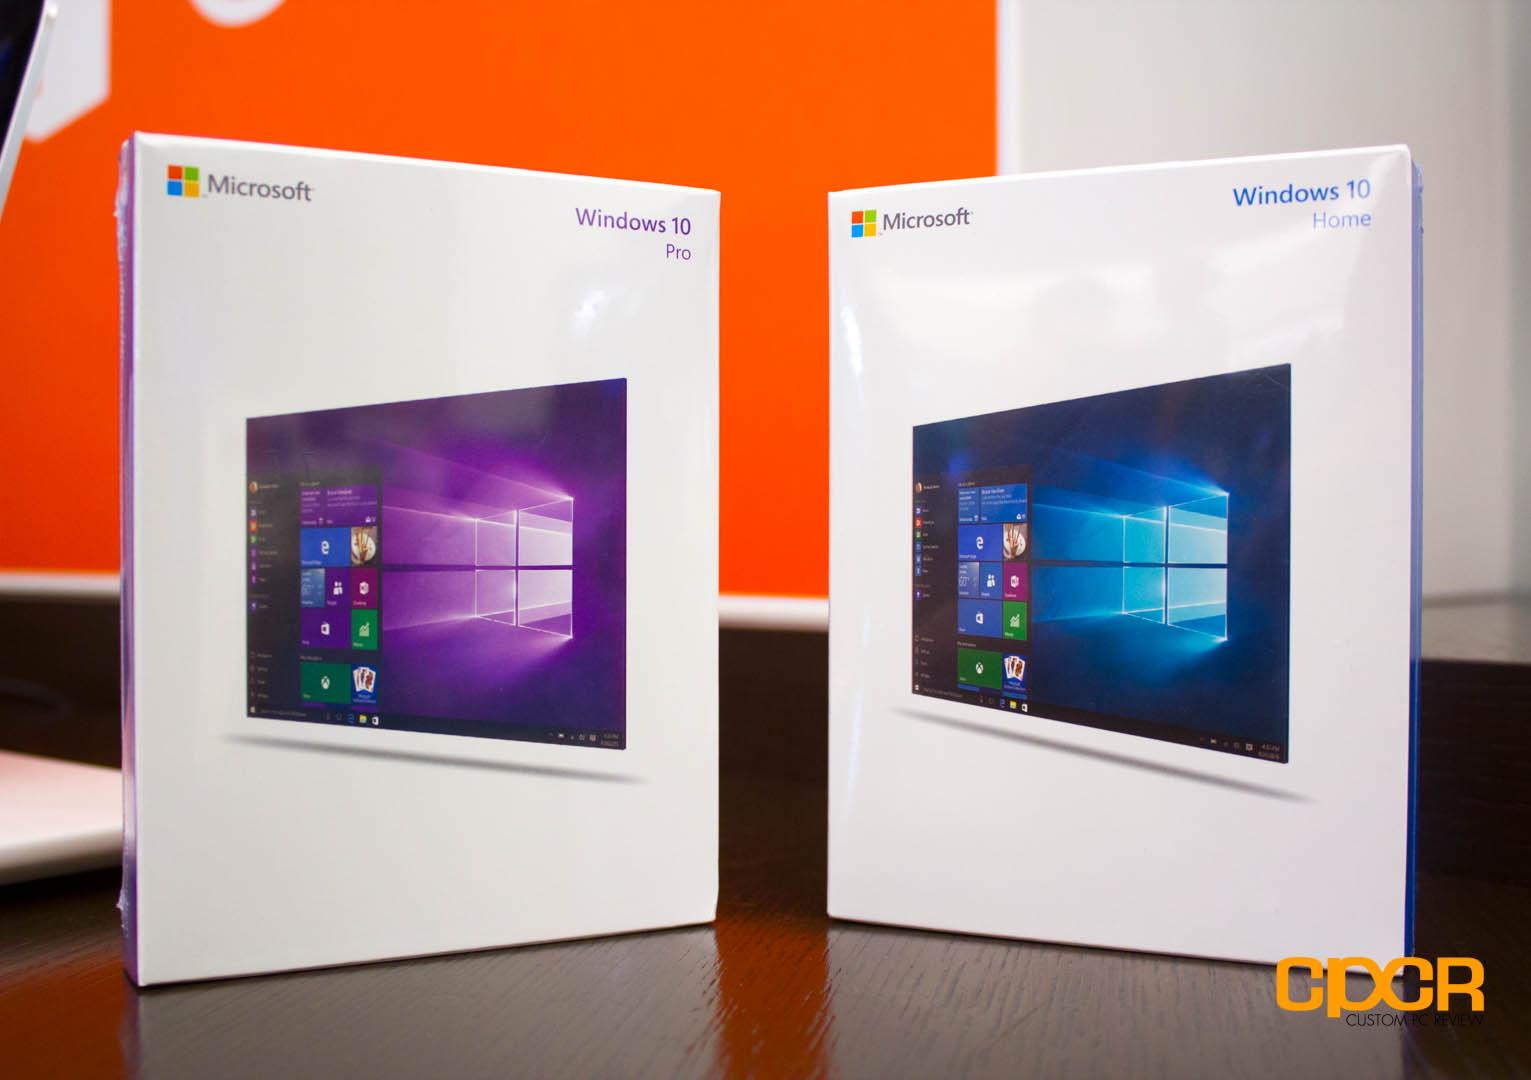 ith Windows 10 , Microsoft launched its next-gen gniazdo bet at home como descargar aplikacja bet at home browser Microsoft ... bet at home obsługi klienta